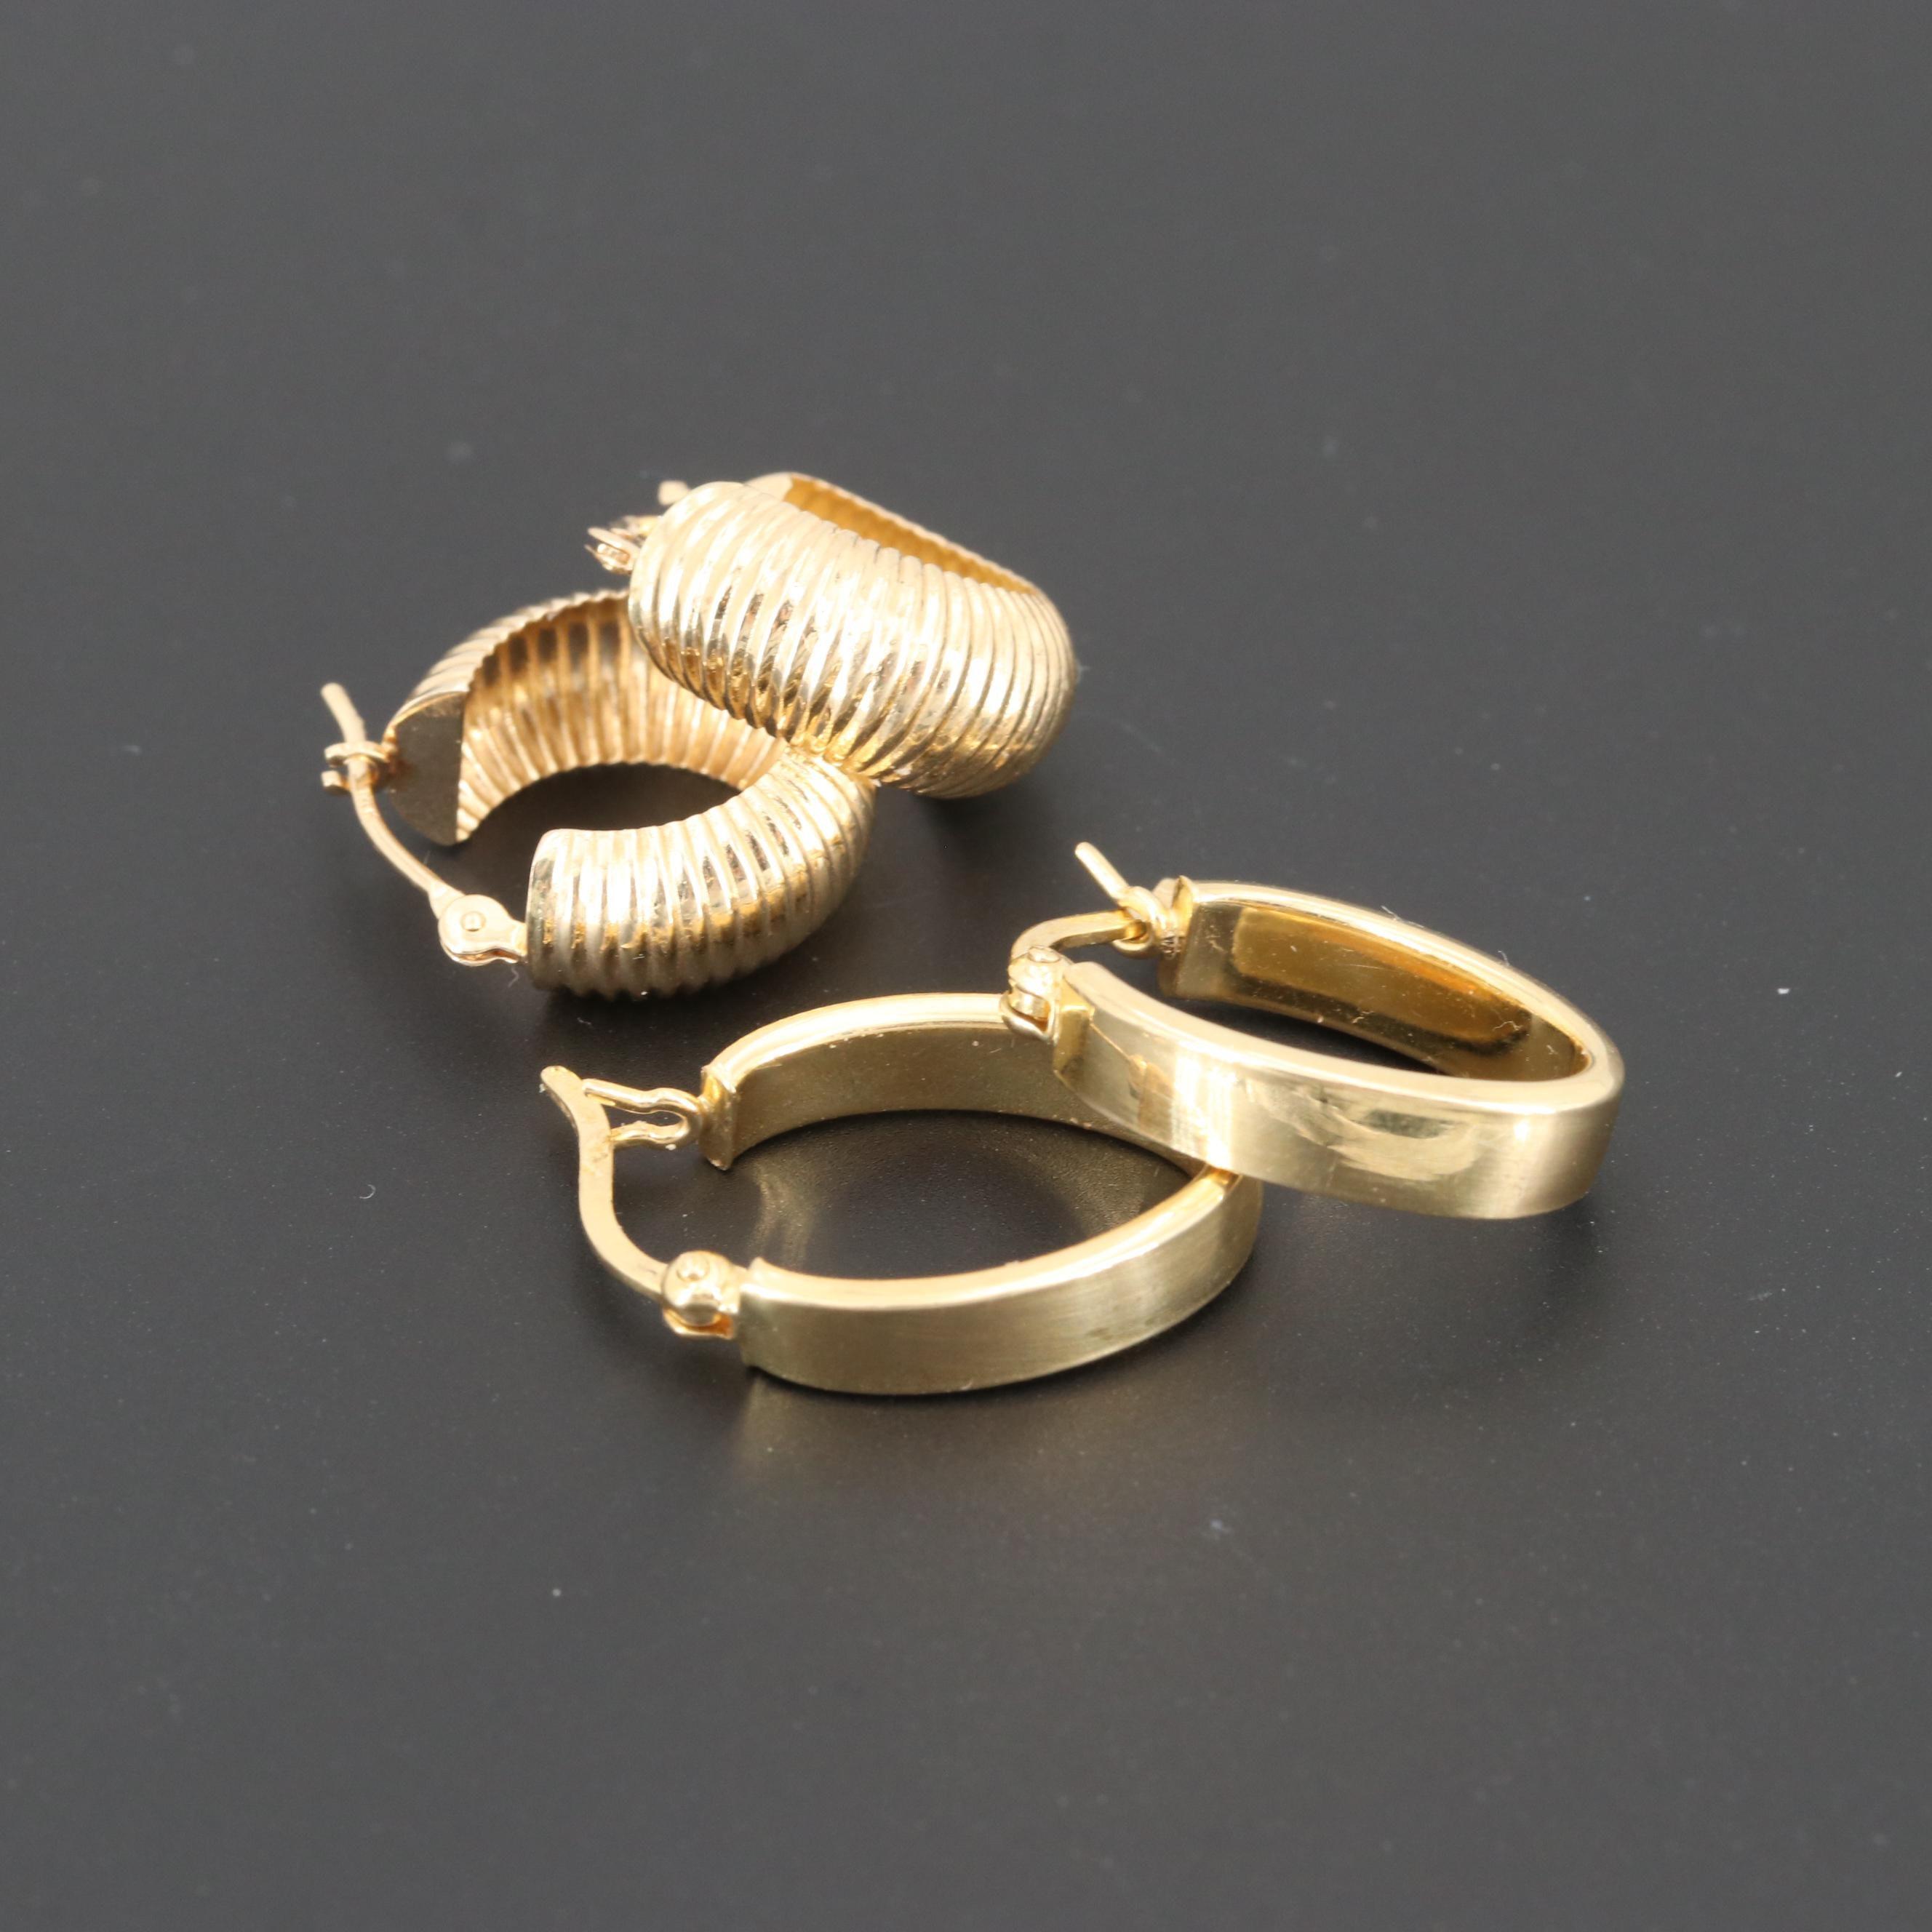 18K and 14K Yellow Gold Hoop Earrings